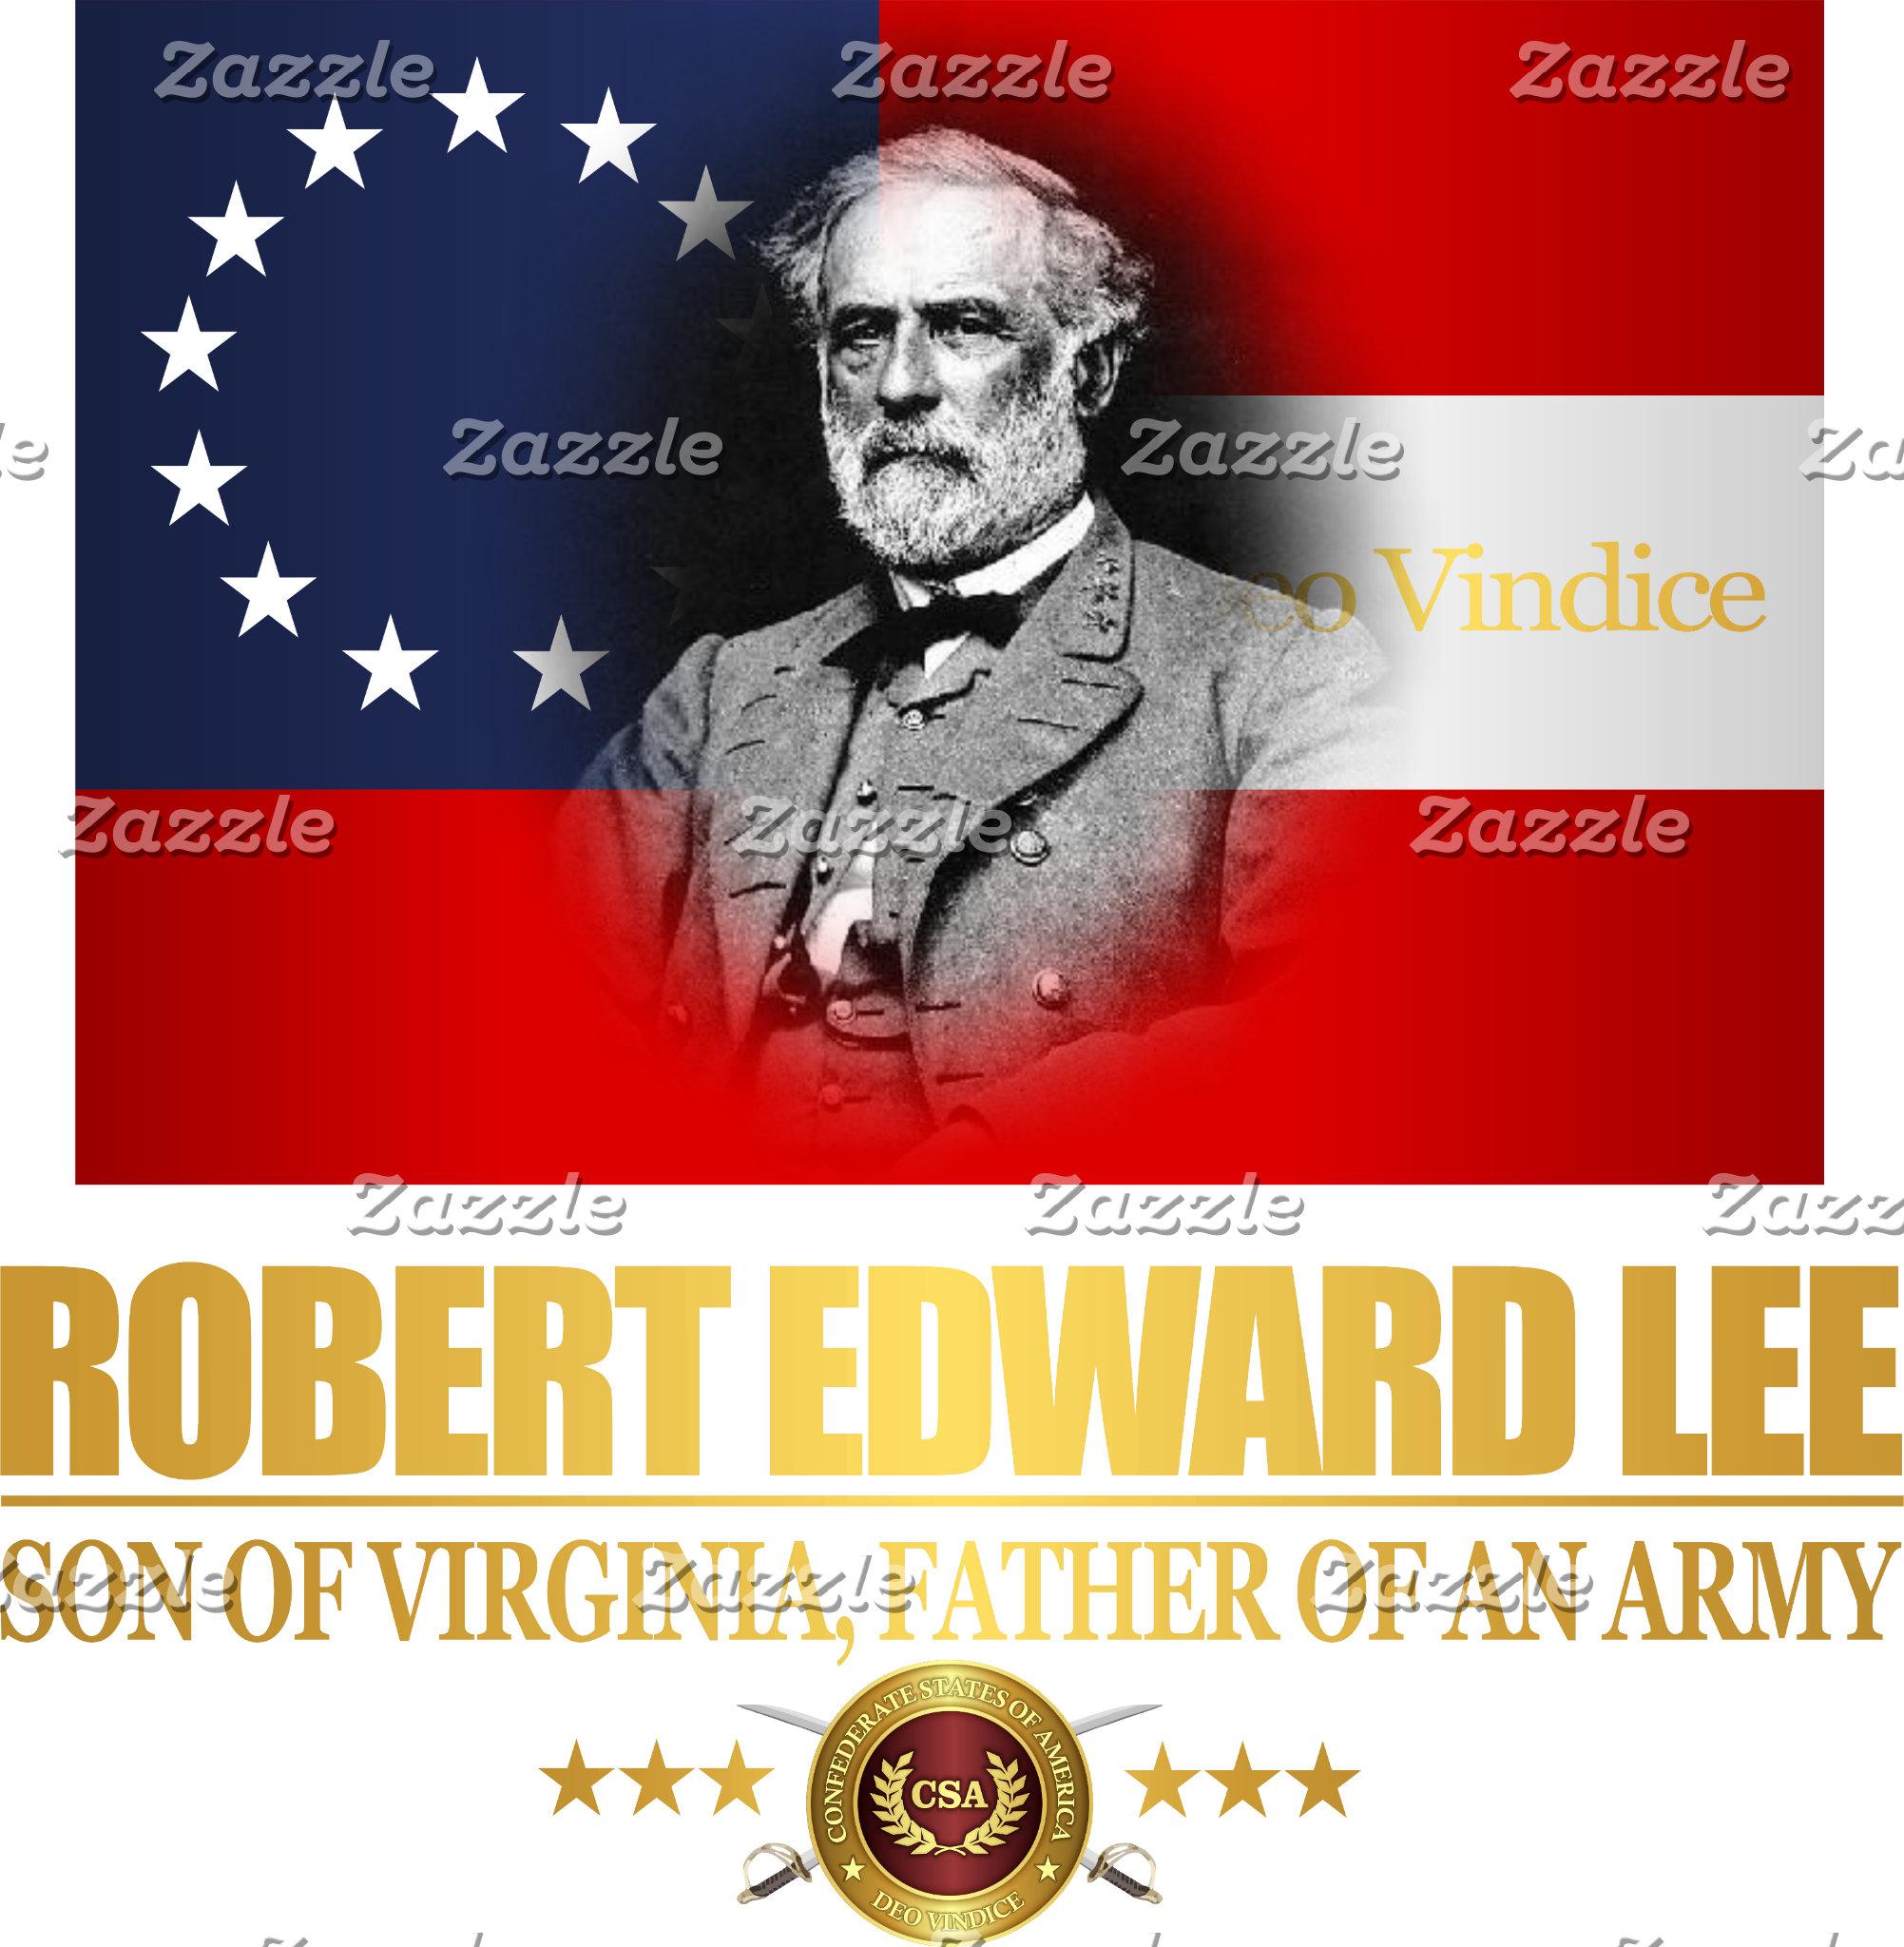 Southern Patriot